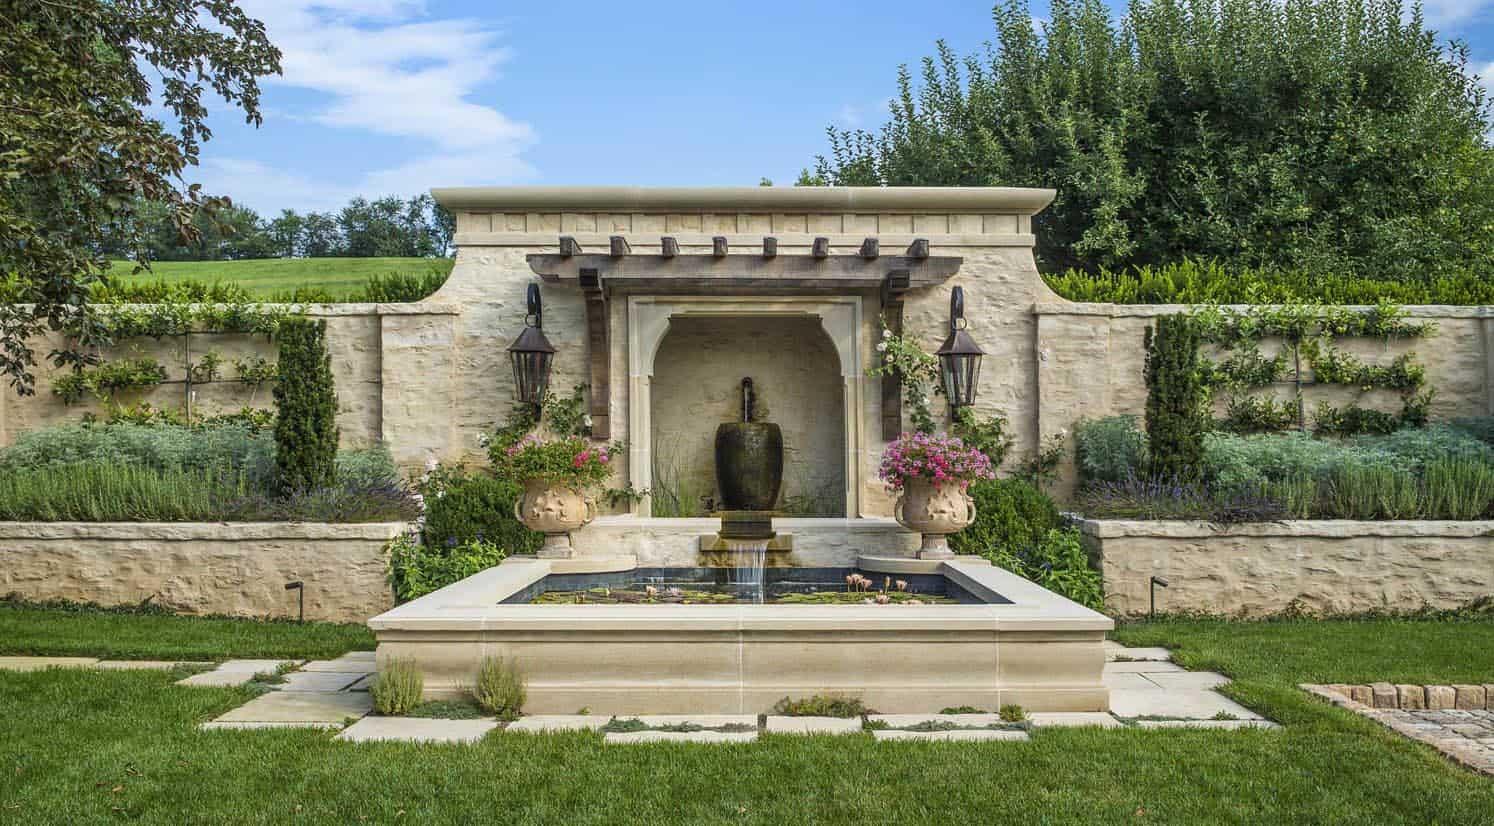 farmhouse-modern-home-landscape-water-feature